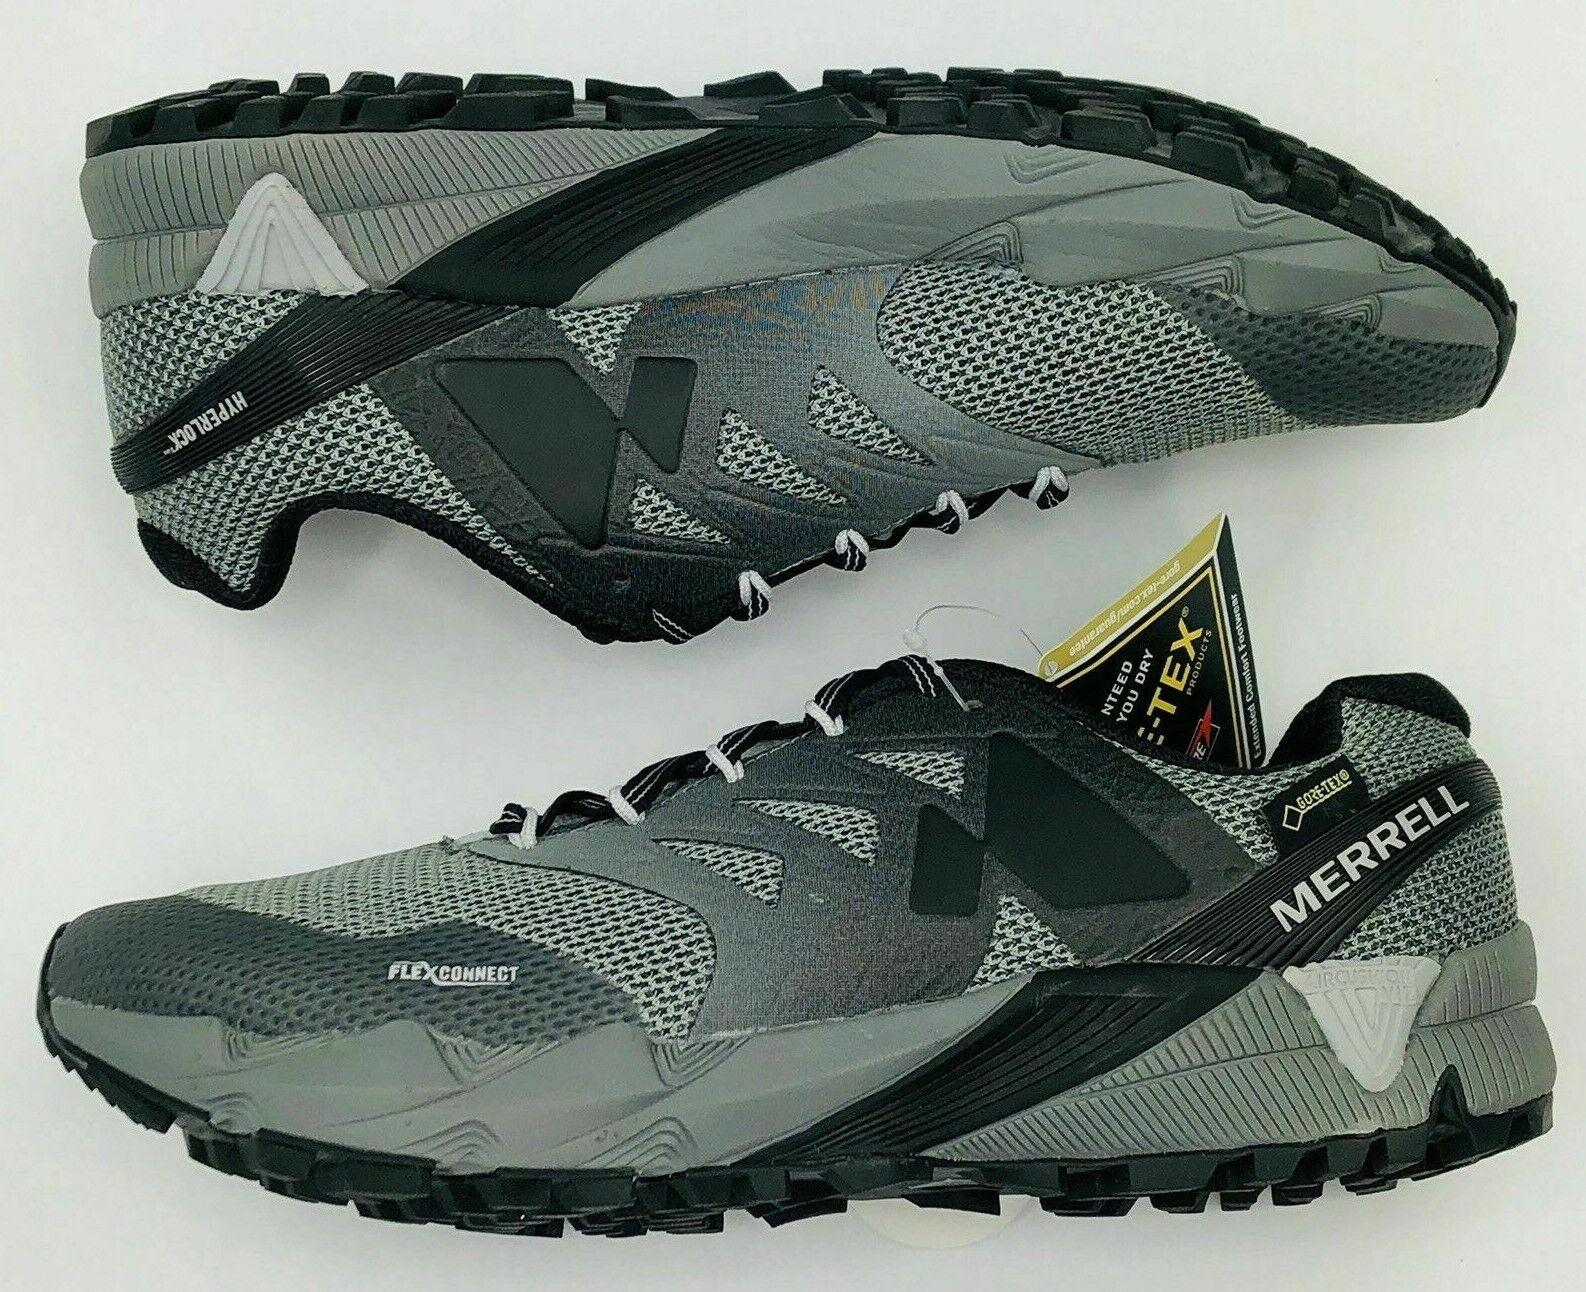 213e4327 Merrell Agility Peak Flex Gore-tex Trail Hiking para hombres Nuevos 2  Zapatos ntvsqs6117-Zapatillas deportivas